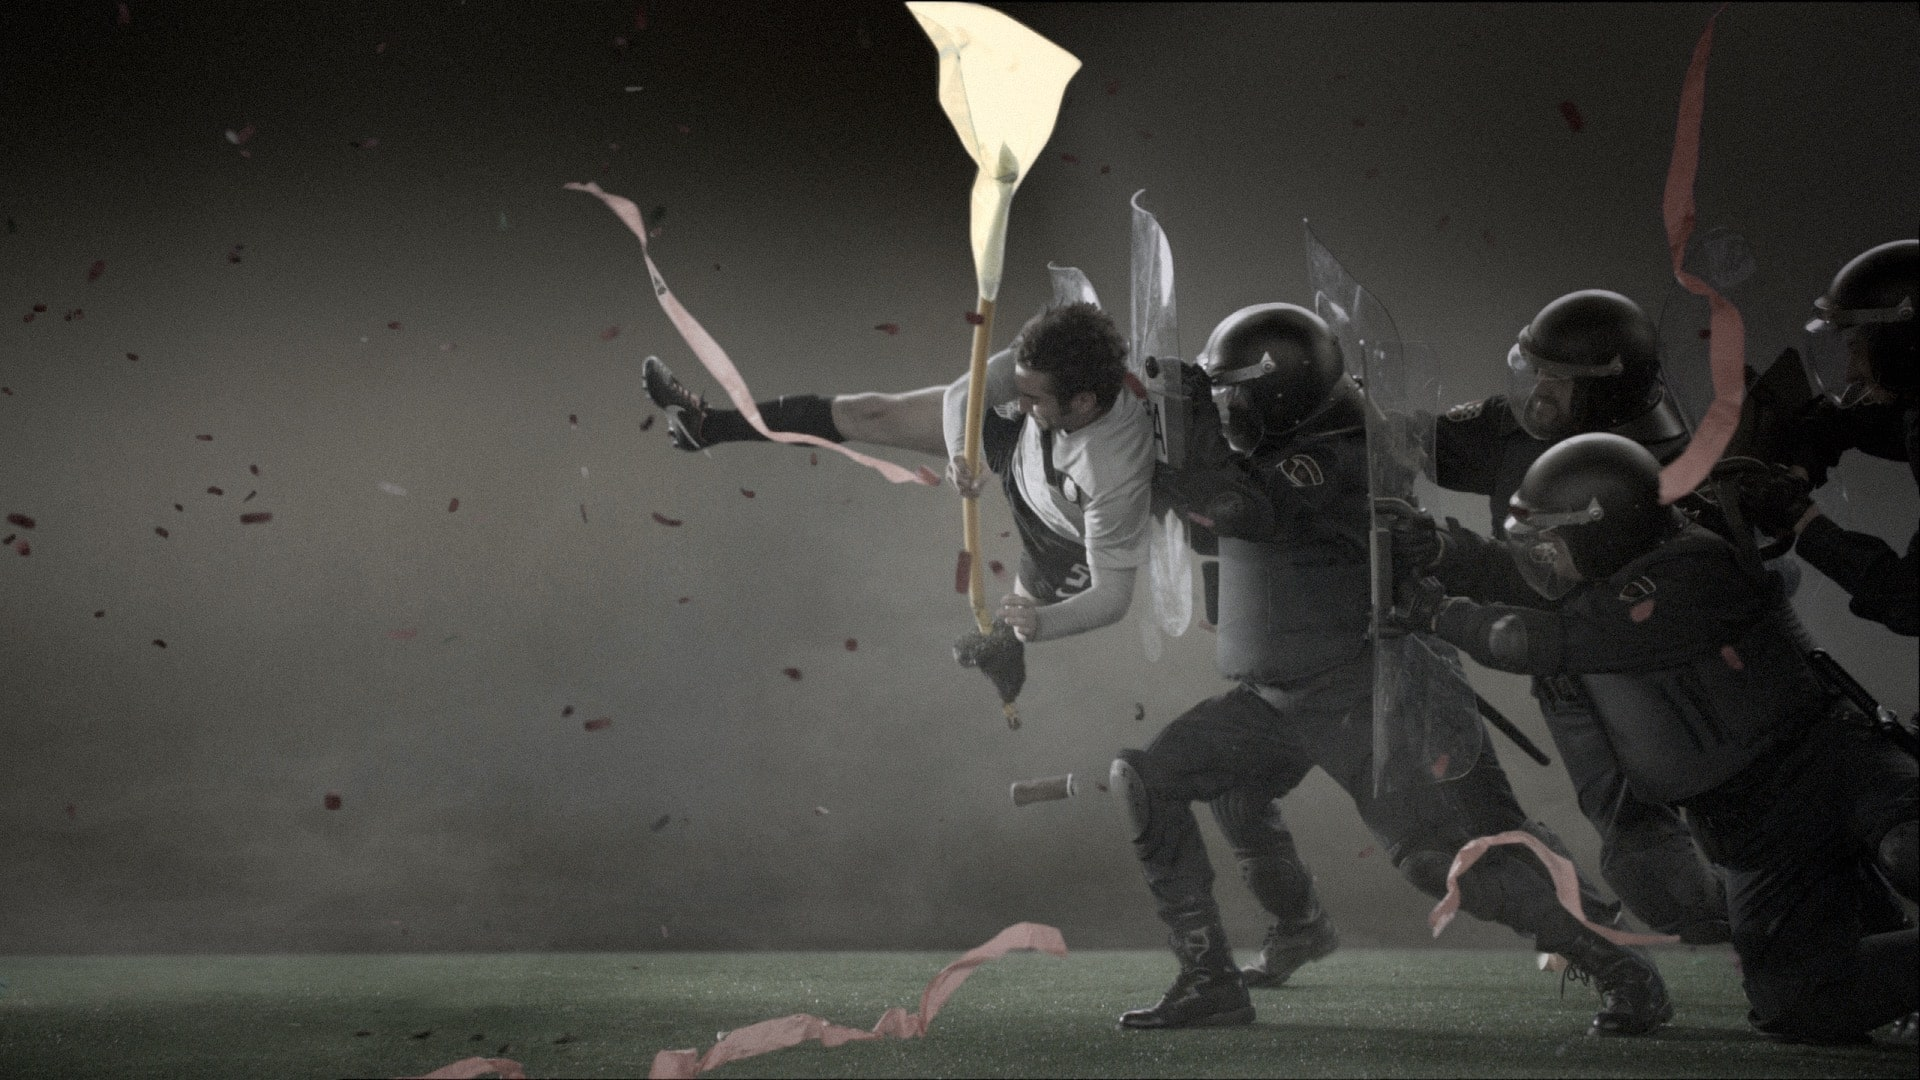 SplashPage_Nike-min.jpg